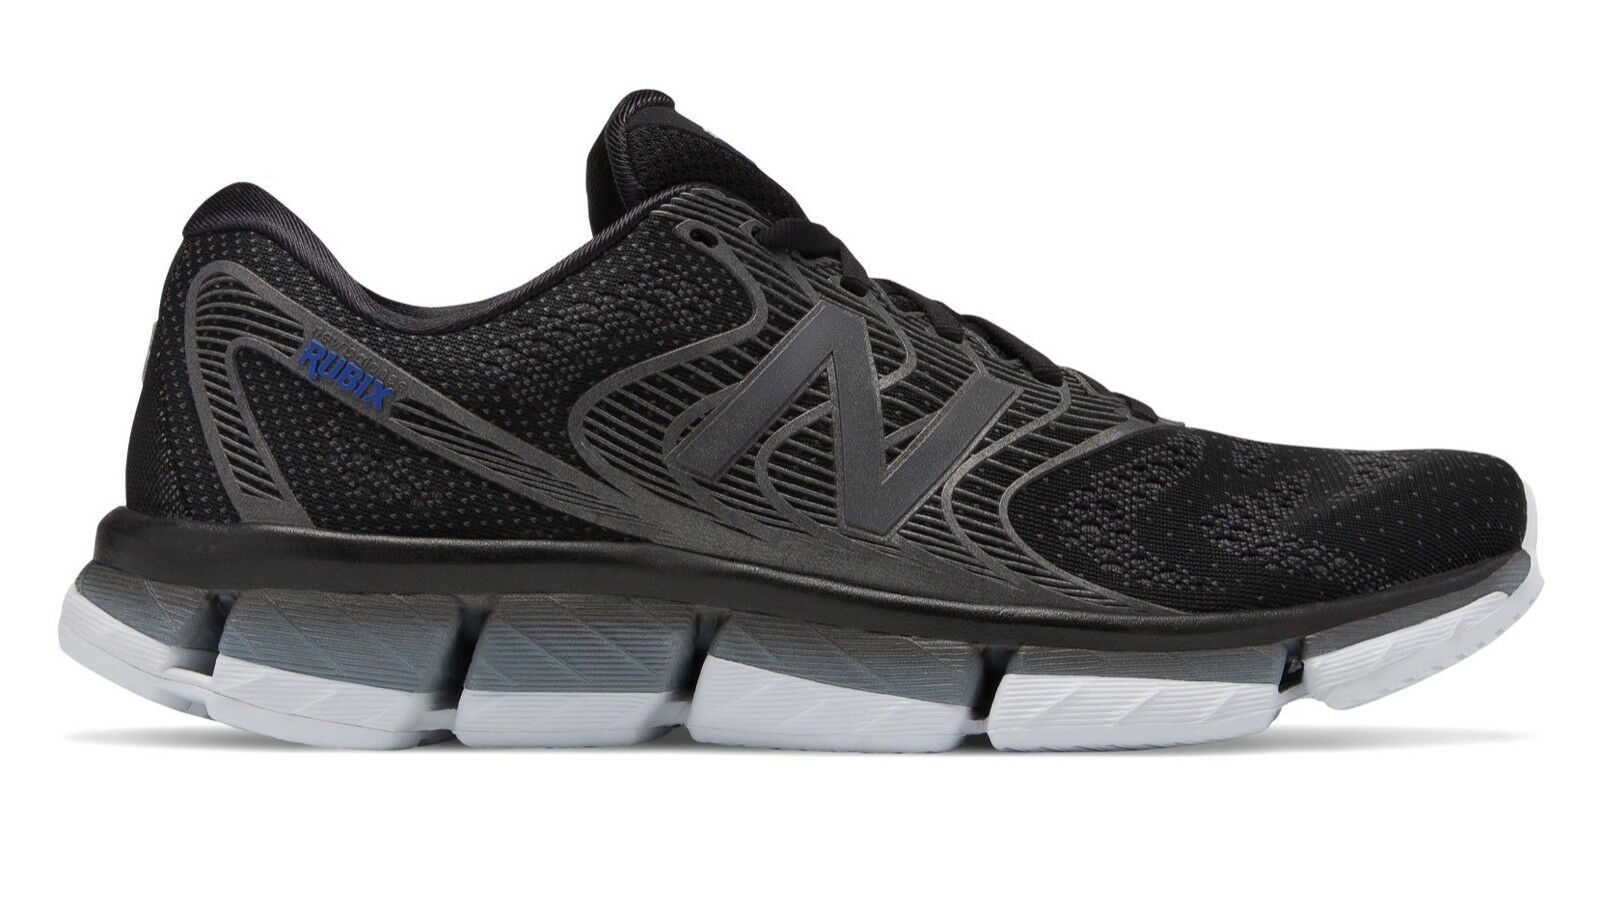 New Balance Men's MRUBXBK Running shoes Black with Steel Rubix Brand New